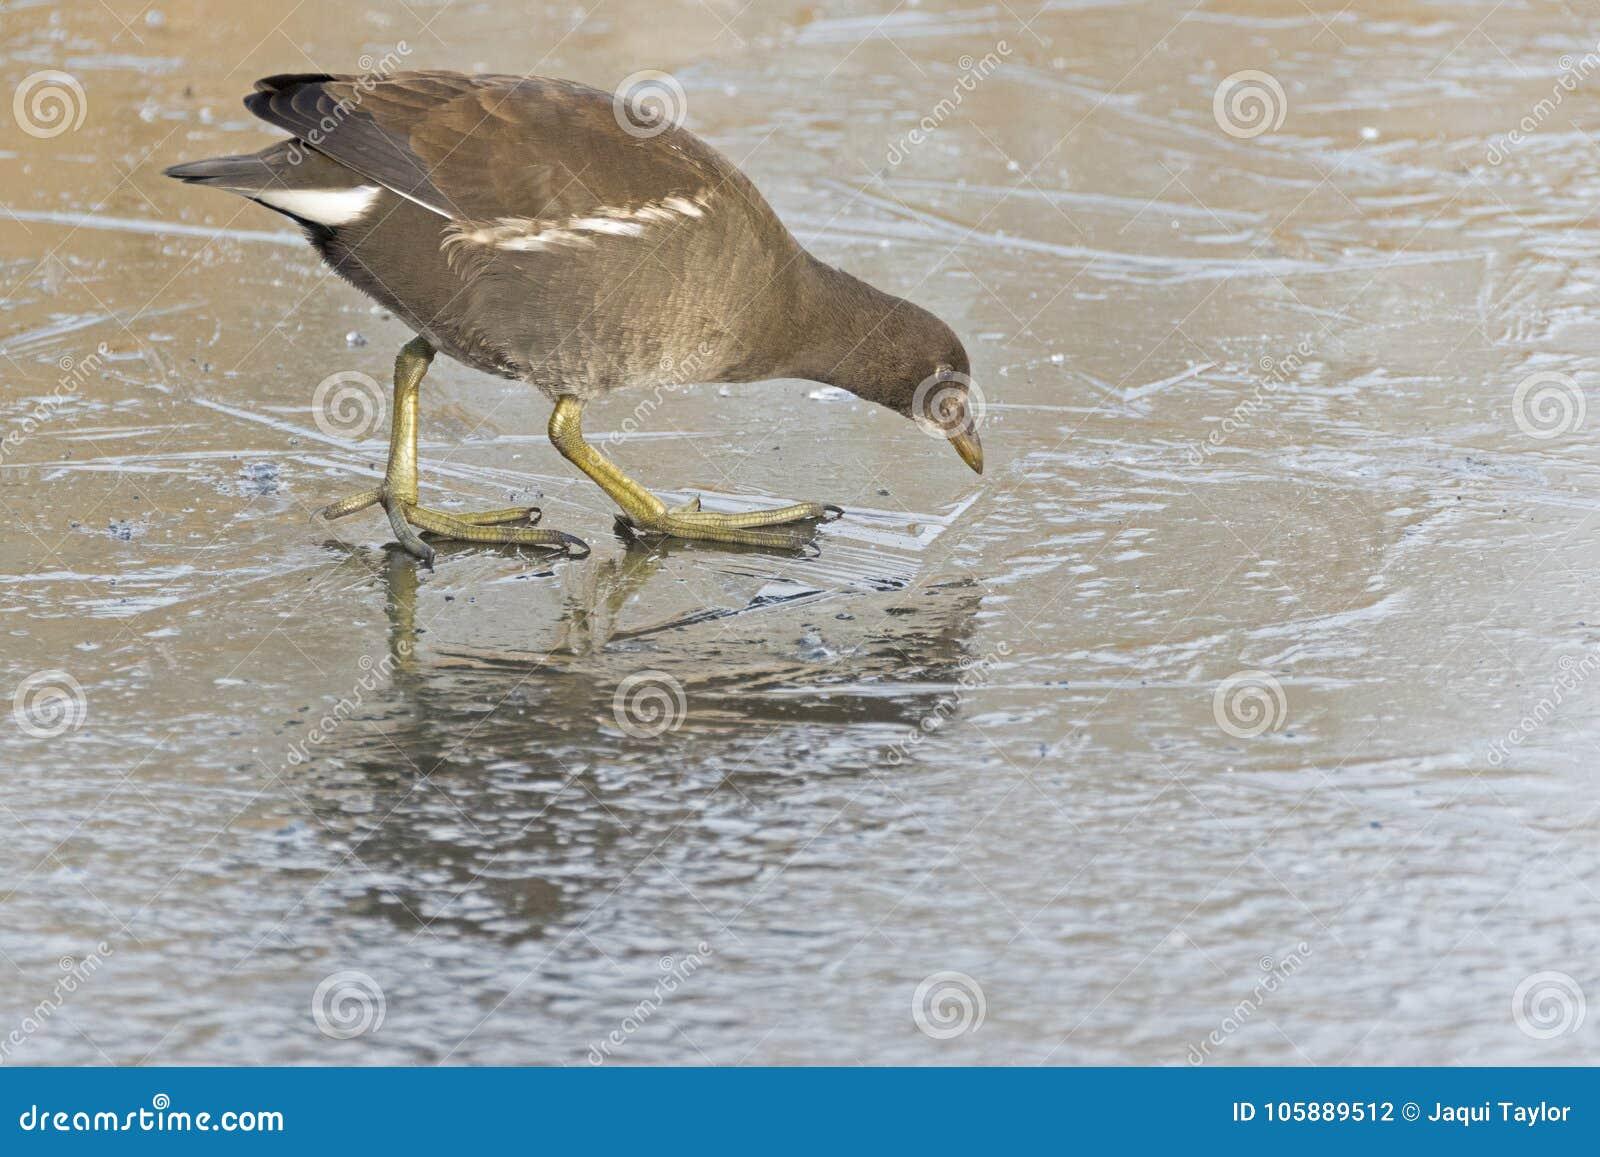 A juvenile moorhen walking on ice